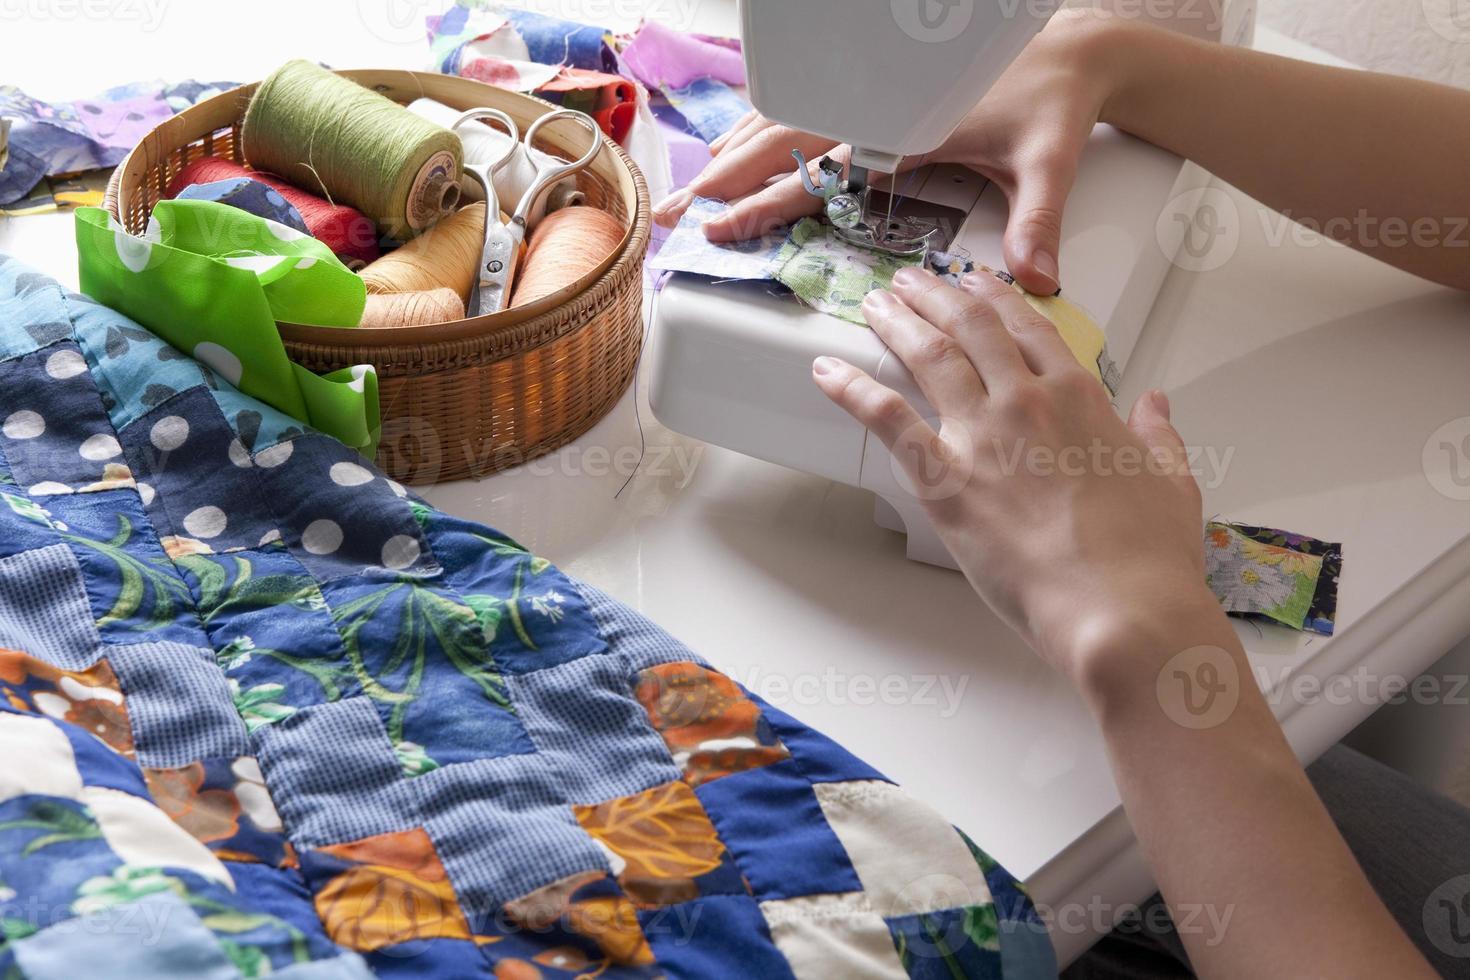 femme, confection, patchwork, couture, machine photo